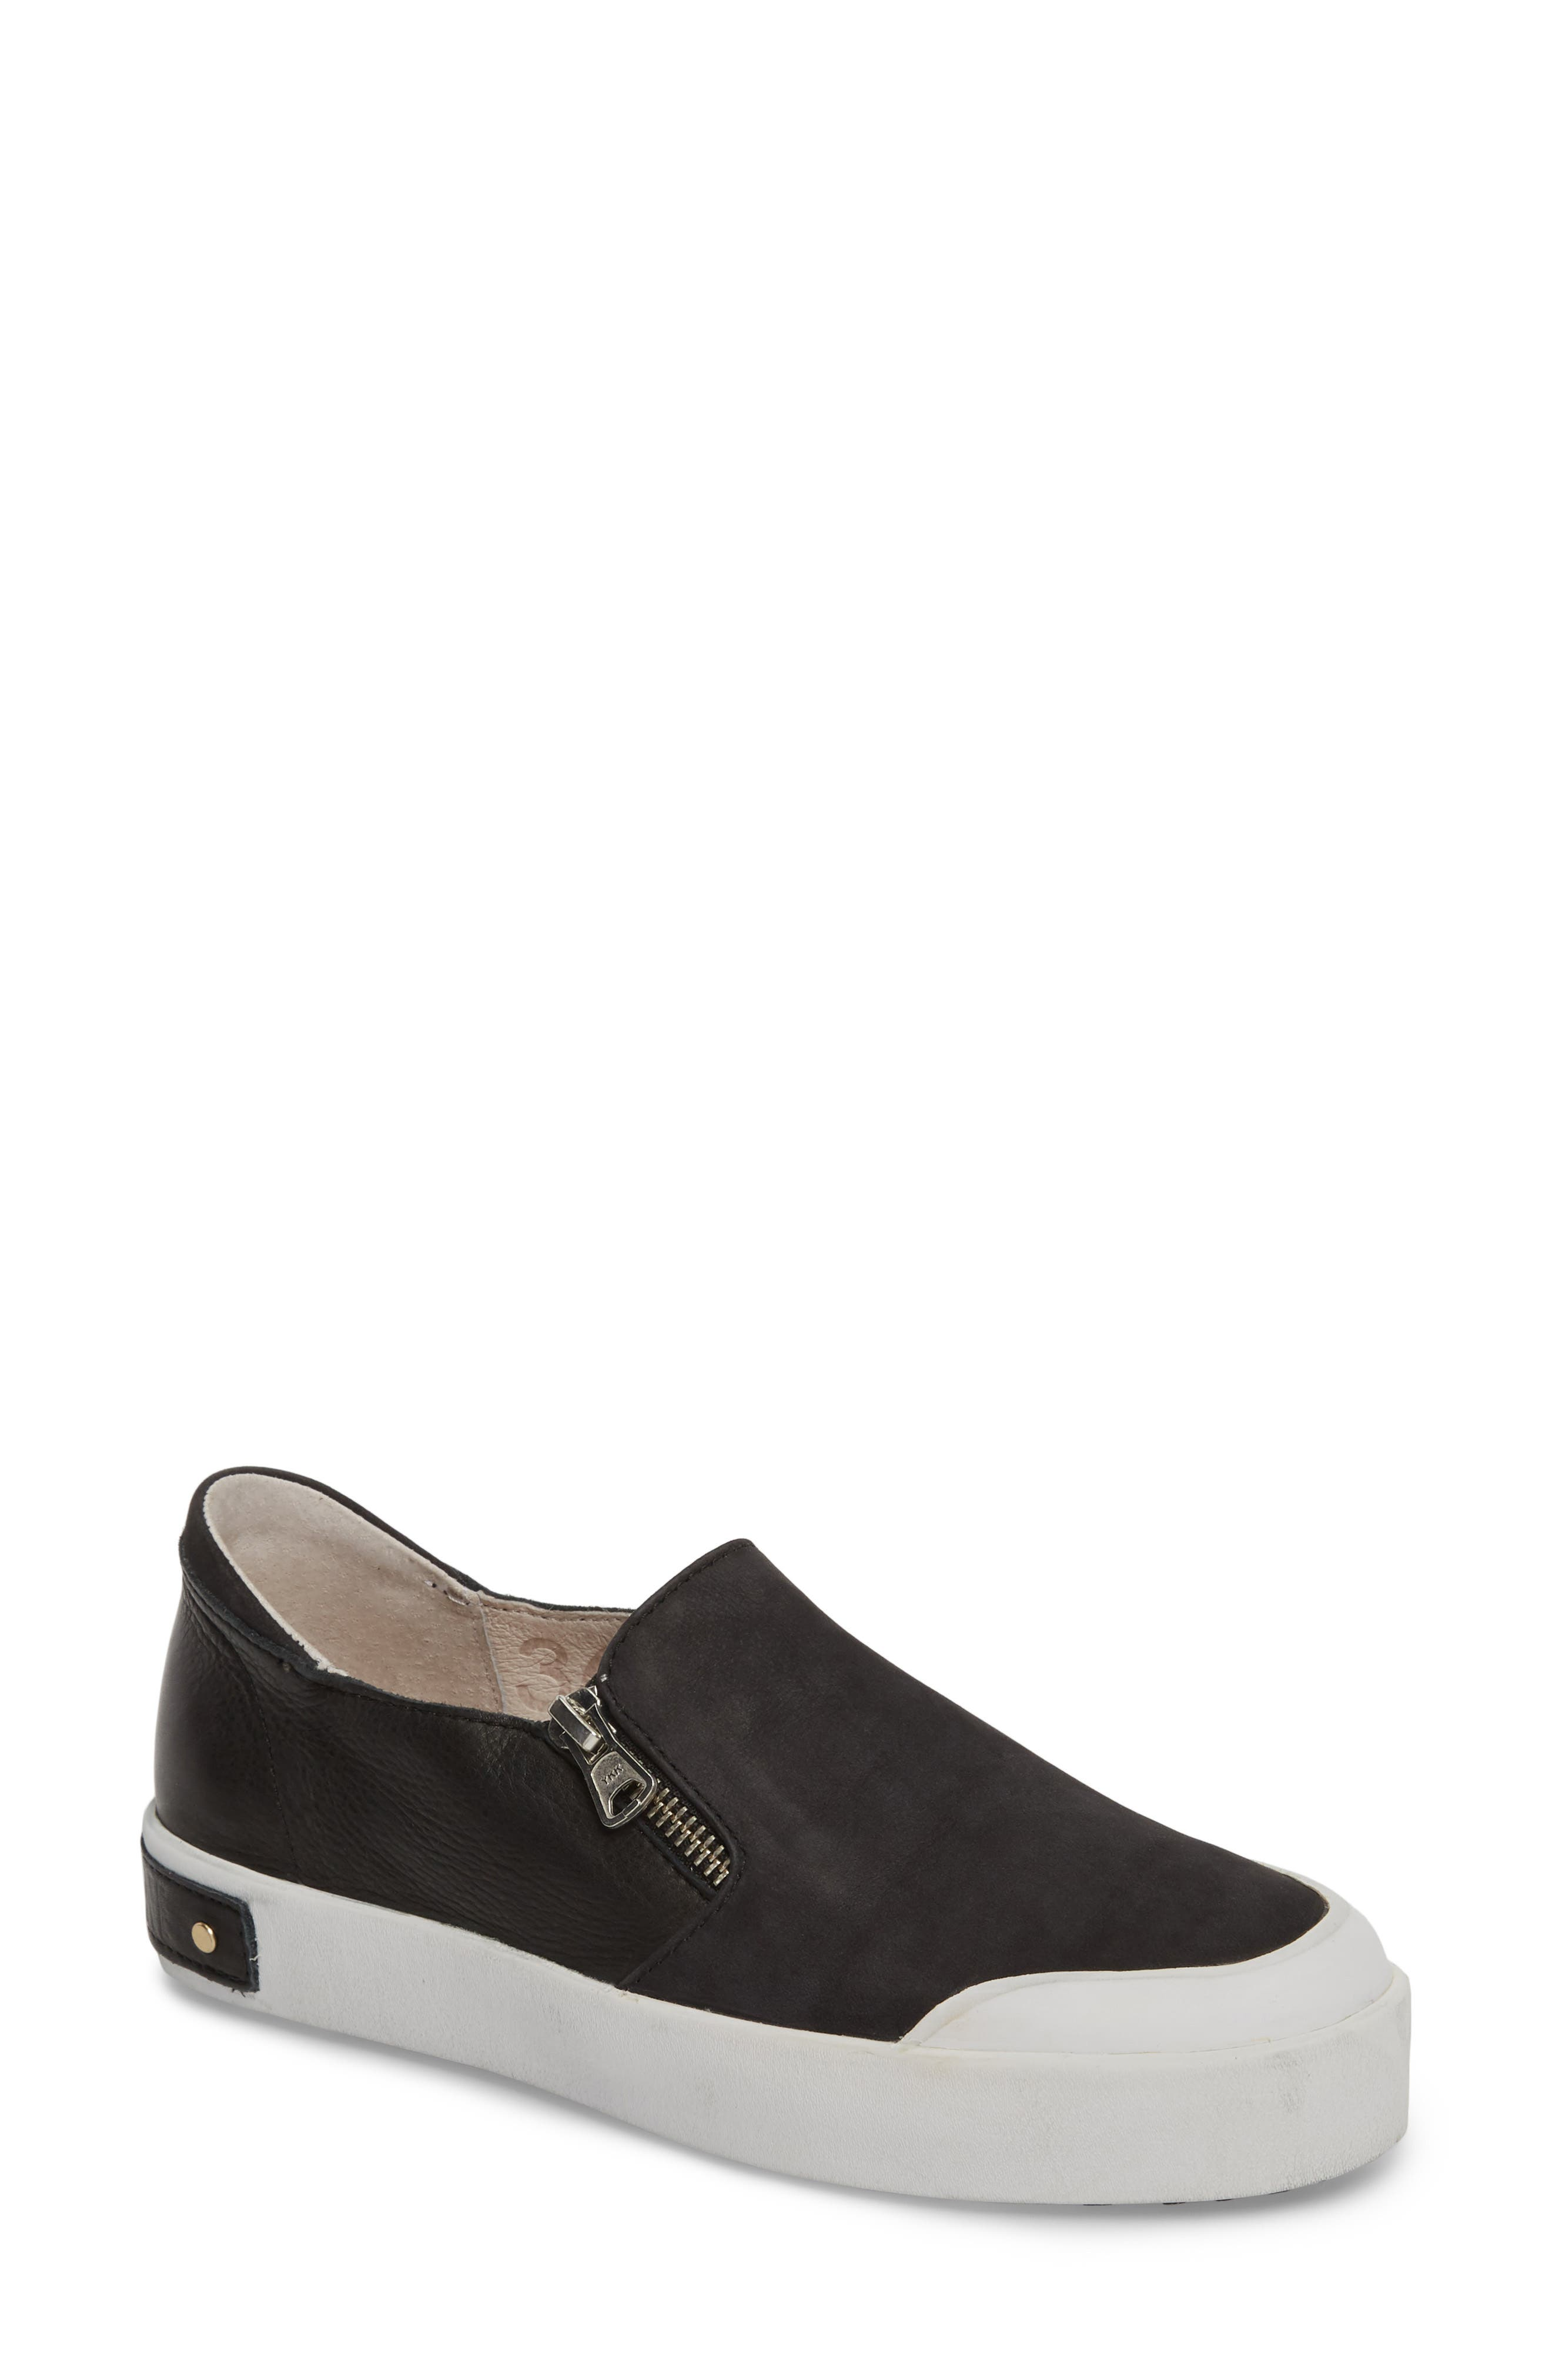 PL82 Slip-On Sneaker,                         Main,                         color, BLACK LEATHER